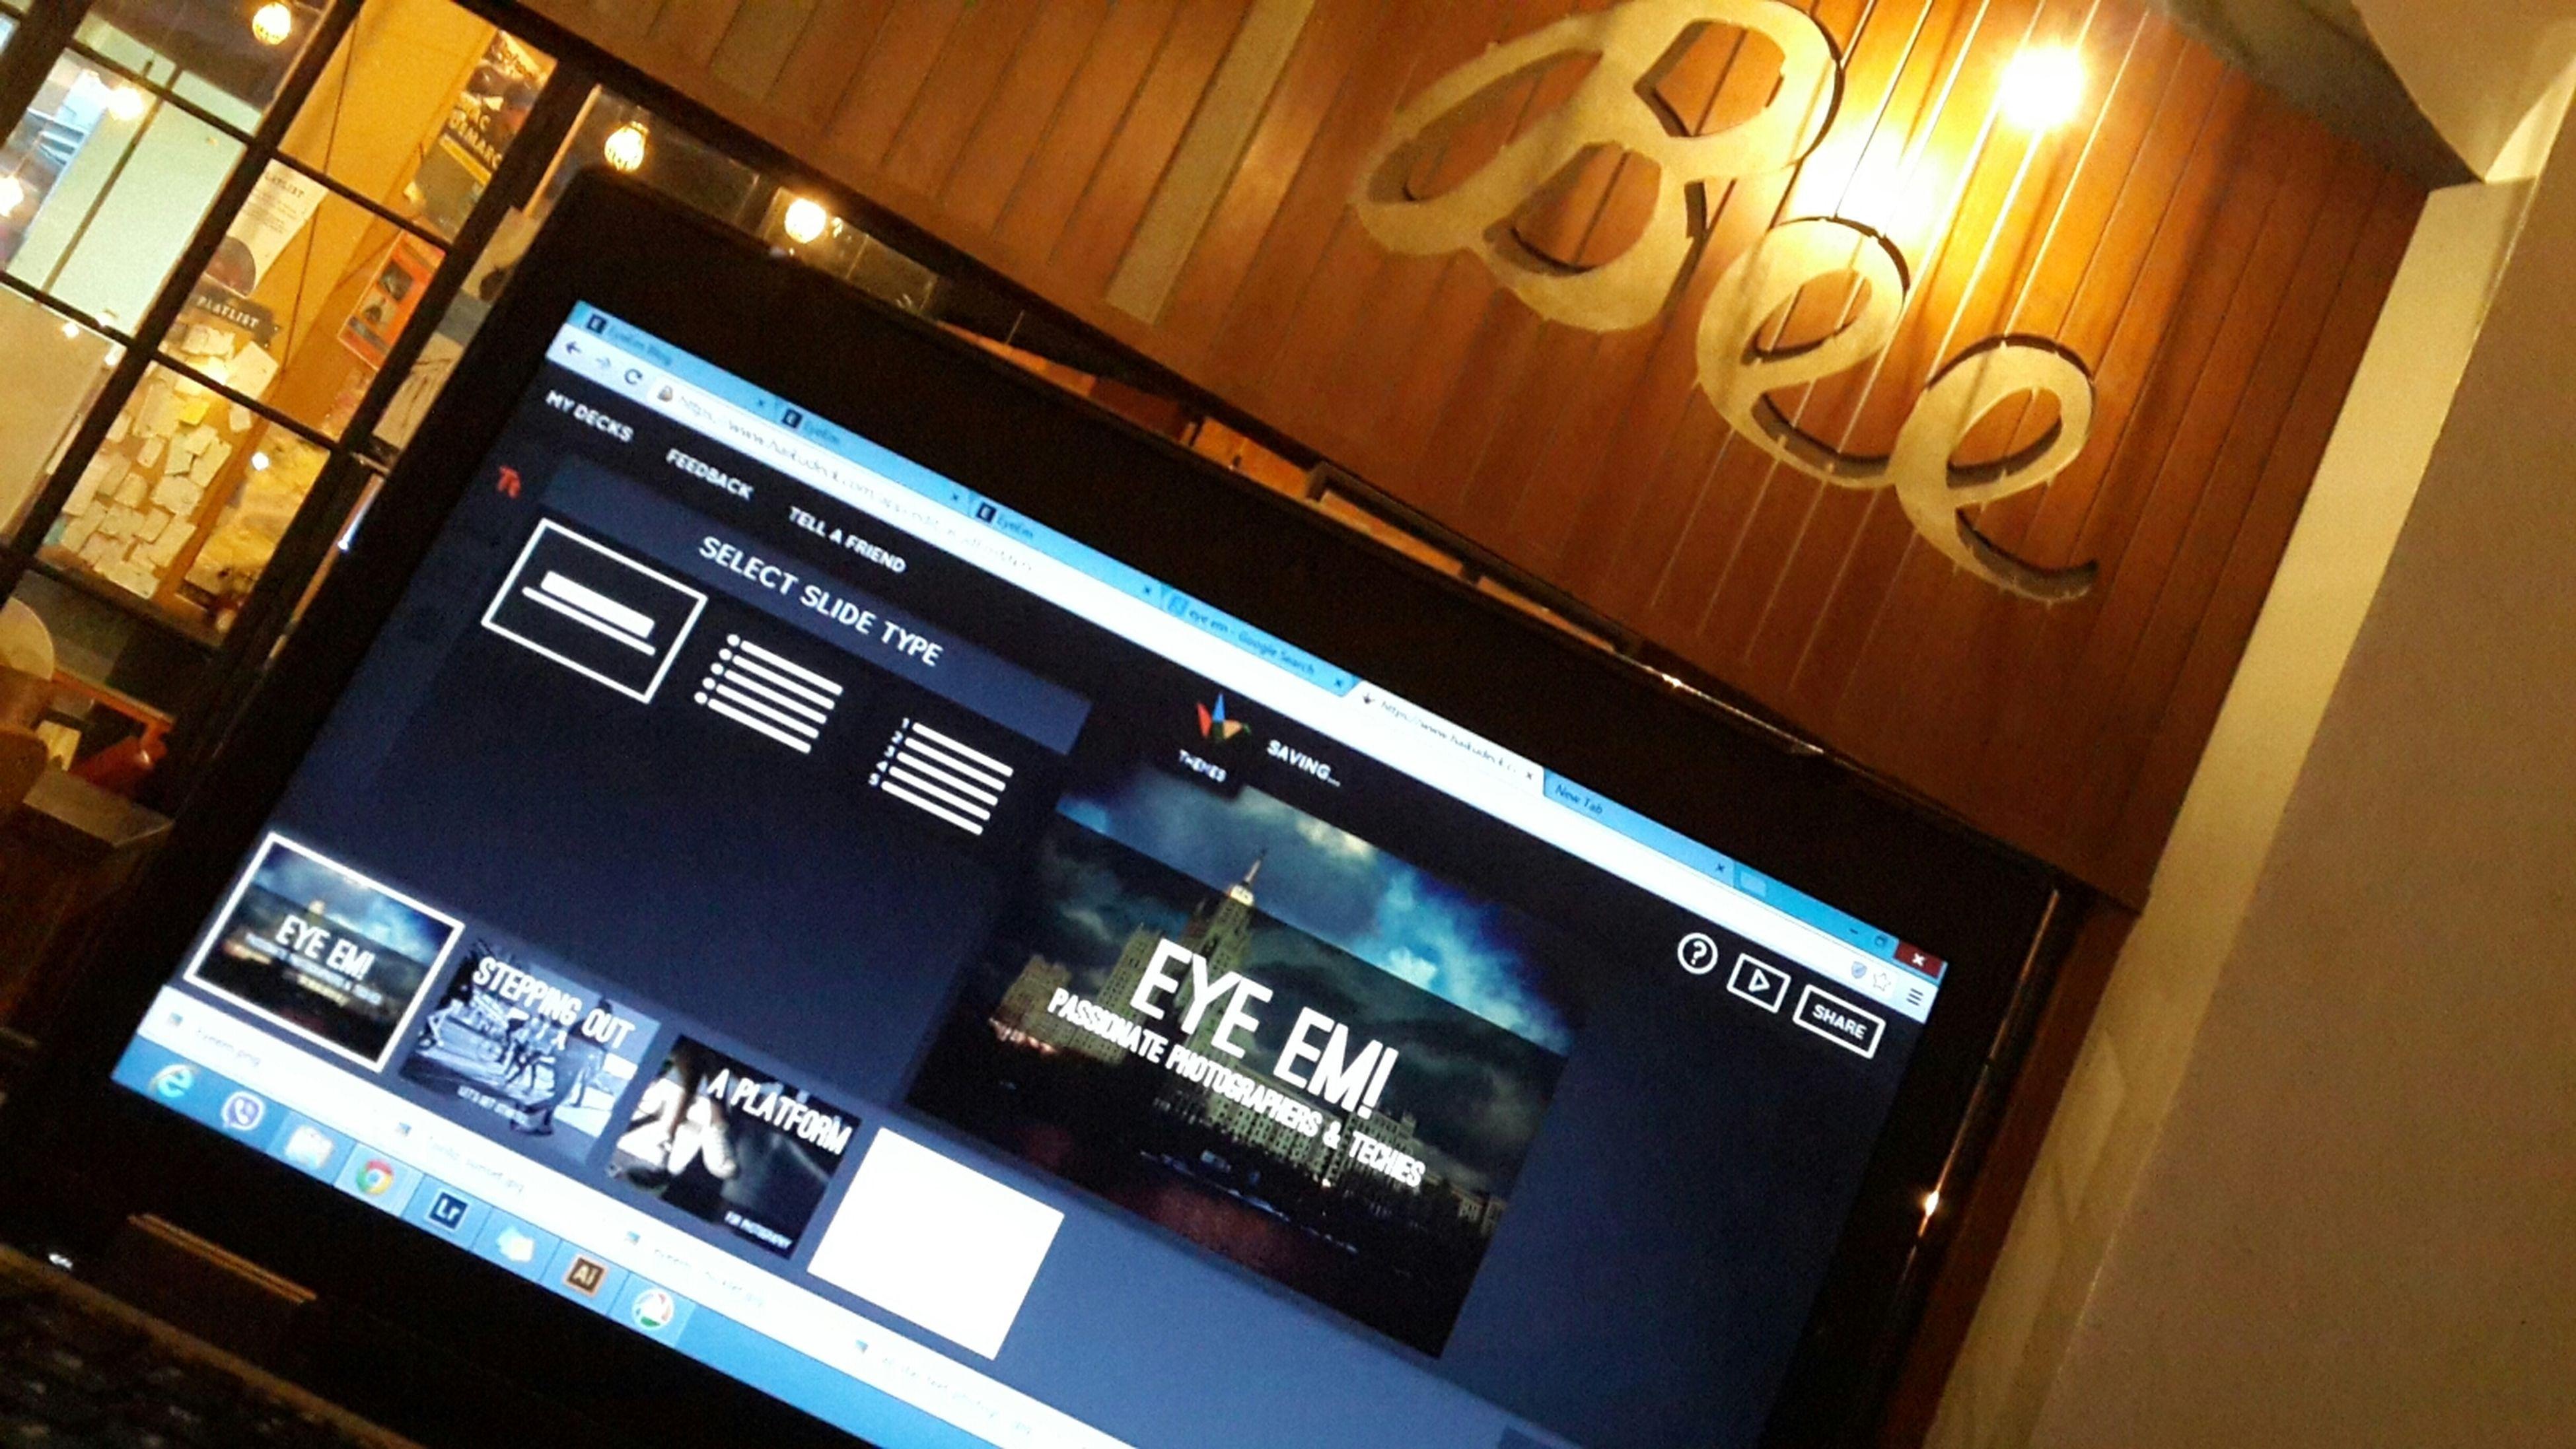 cause I'm presenting Eye Em. EyeEm Haikudeck Cafe Working